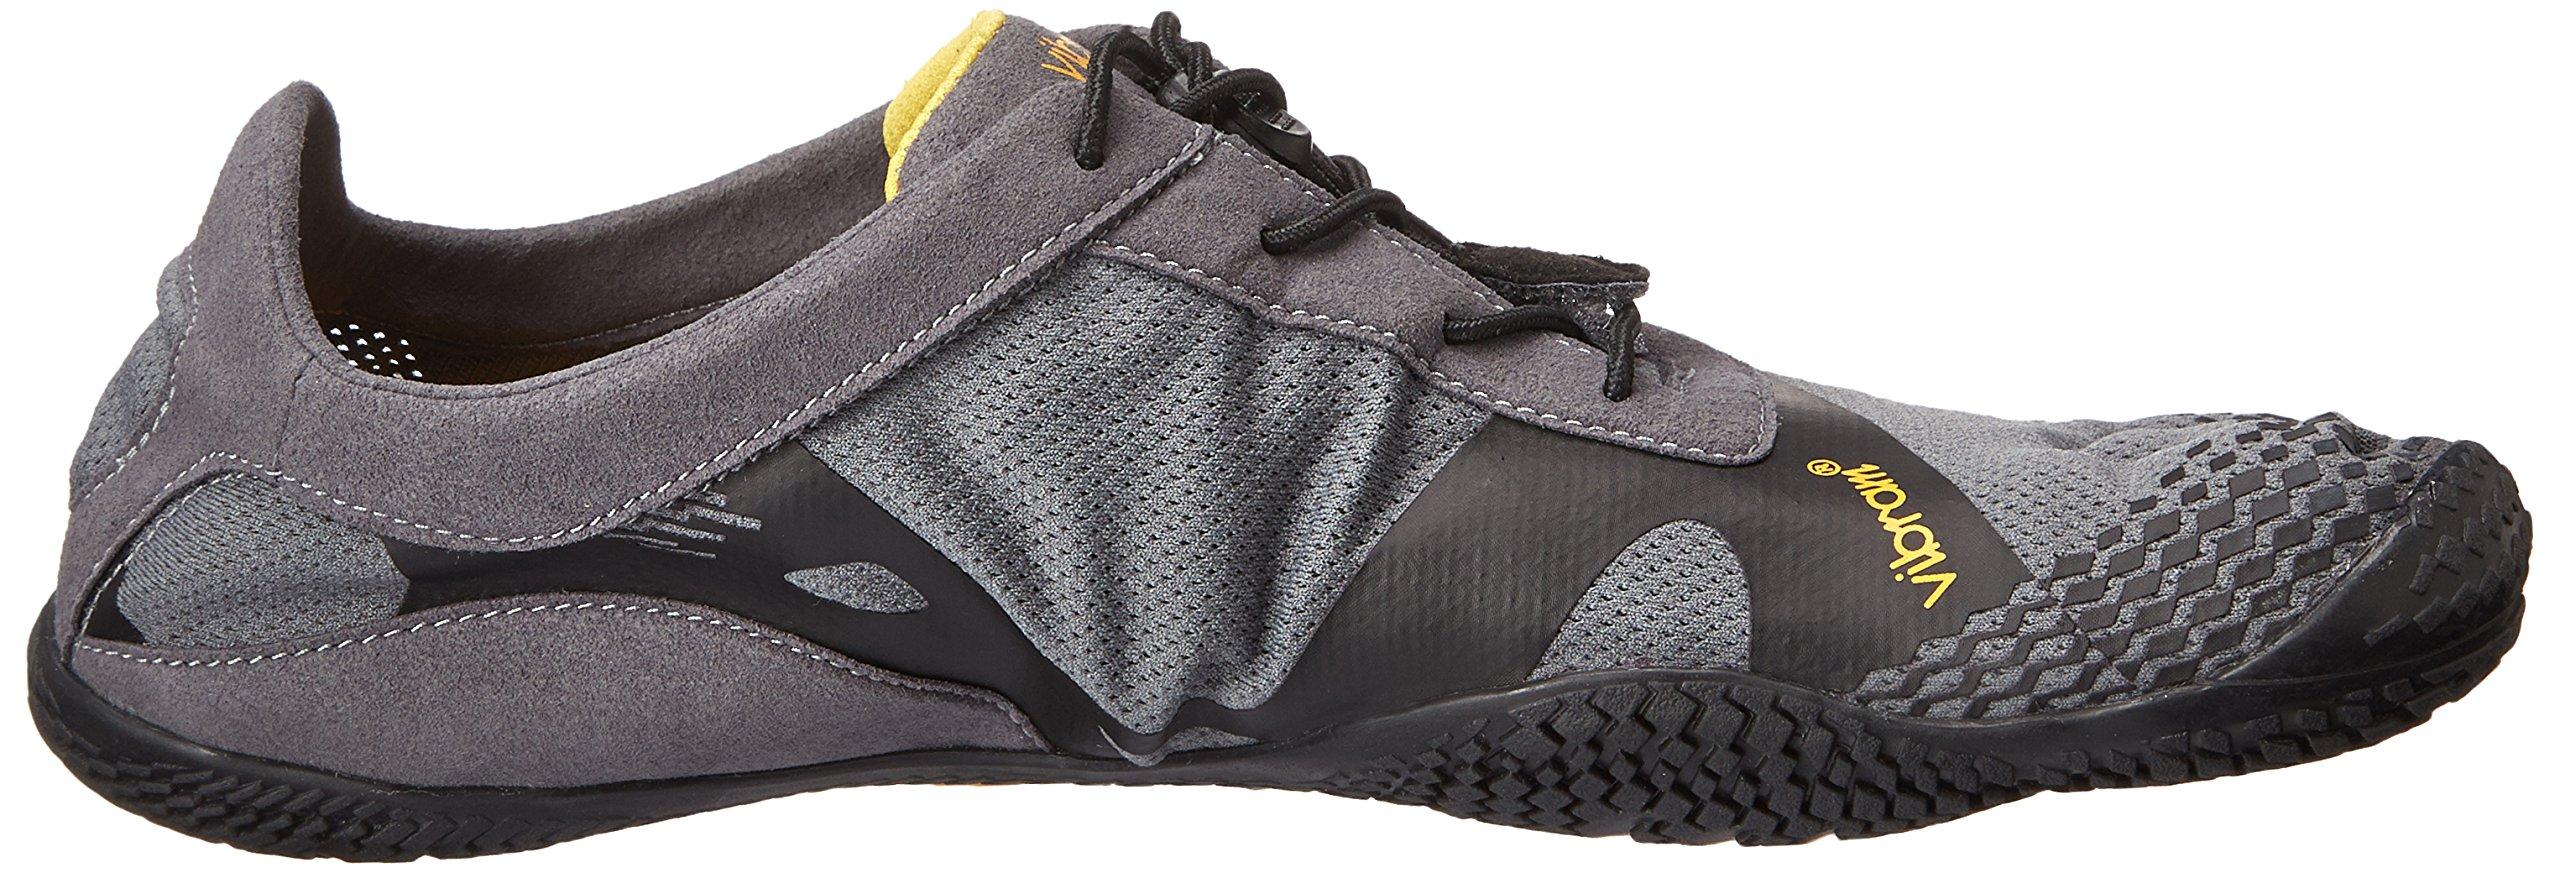 Vibram Men's KSO EVO Cross Training Shoe,Grey/Black,41 EU/8.5-9.0 M US by Vibram (Image #9)